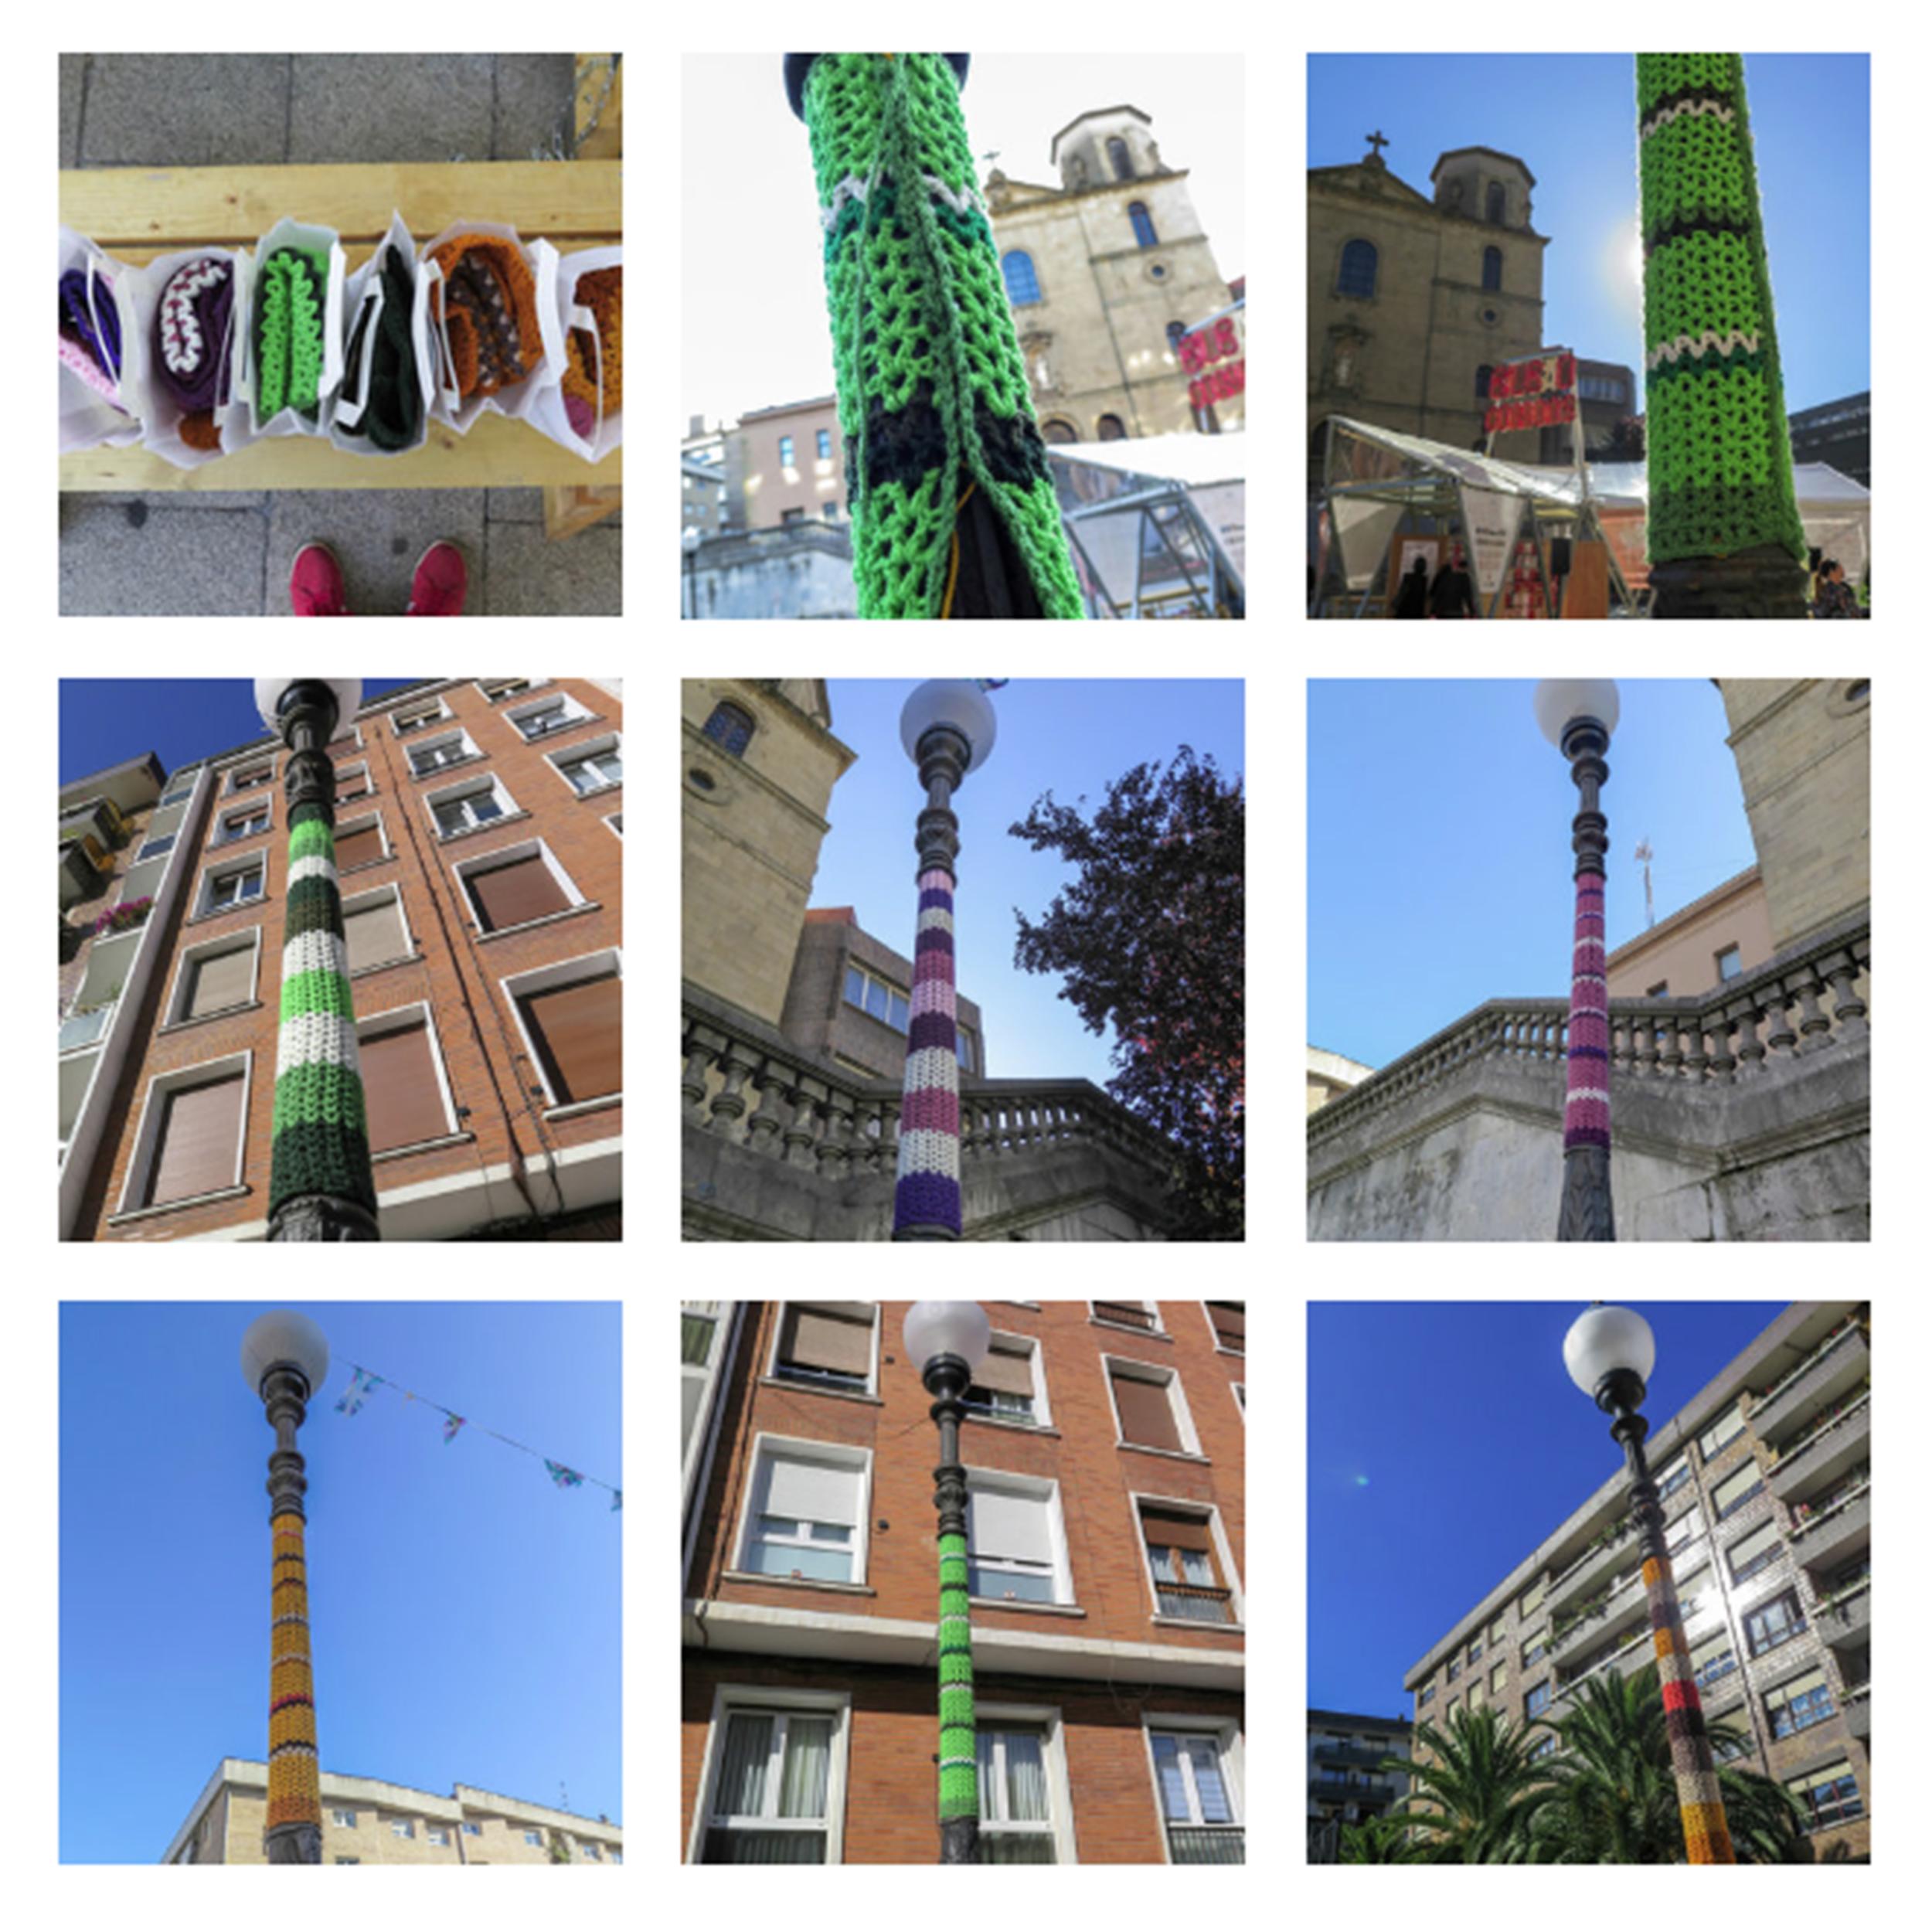 BILBAO COMMONS SANTUTXU_Bilbao, 2017